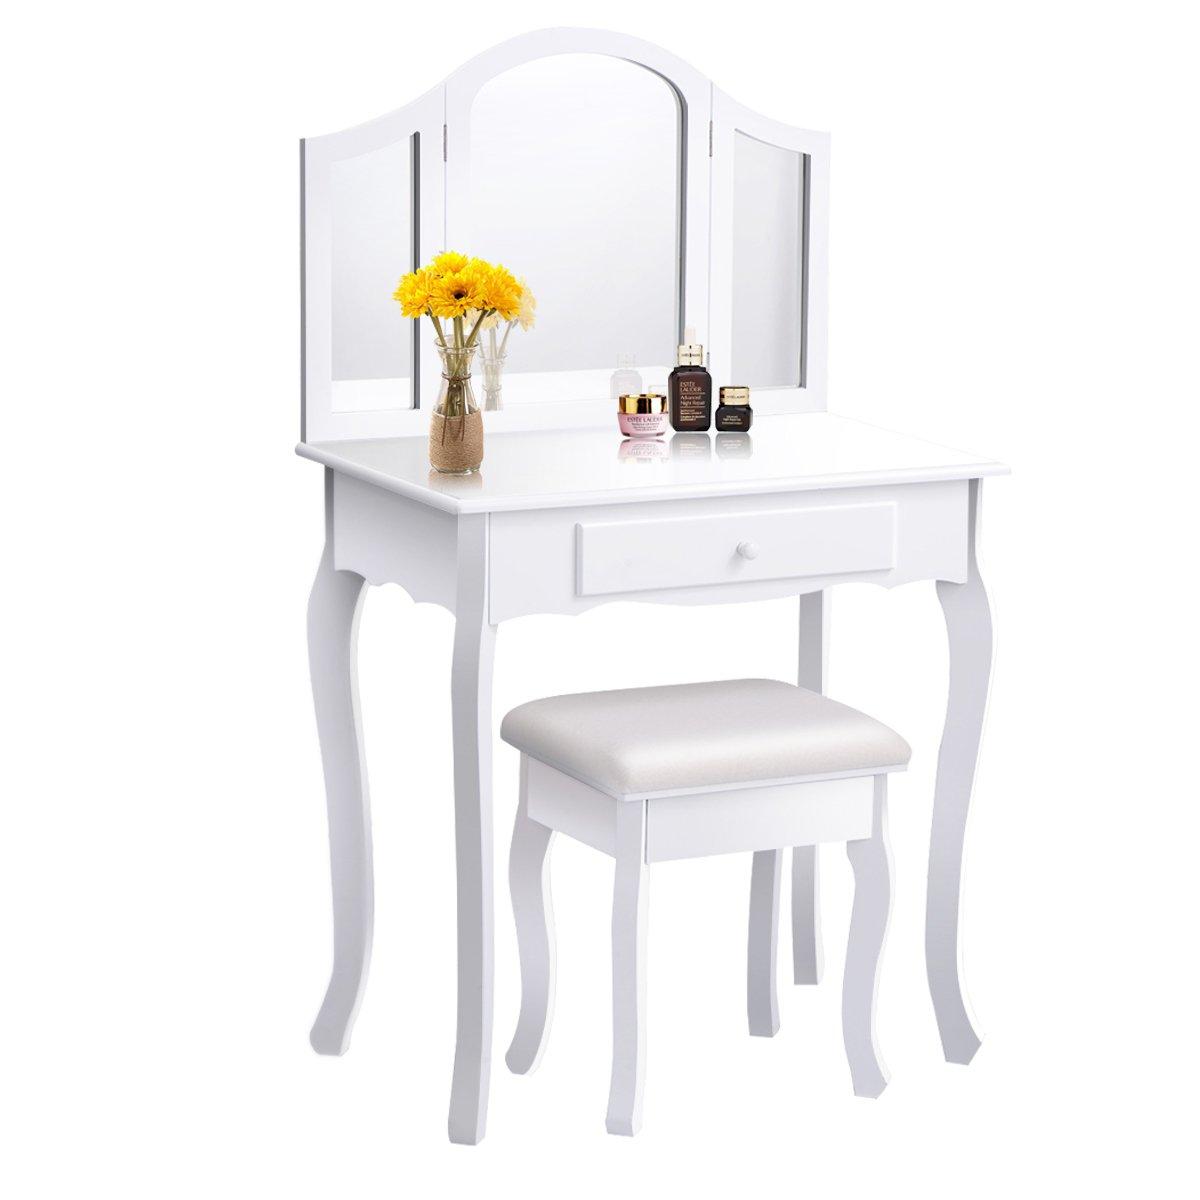 Giantex Bathroom Vanity Makeup Table Set w/ Tri-folding Mirror & Cushioned Stool Dressing Table (White)